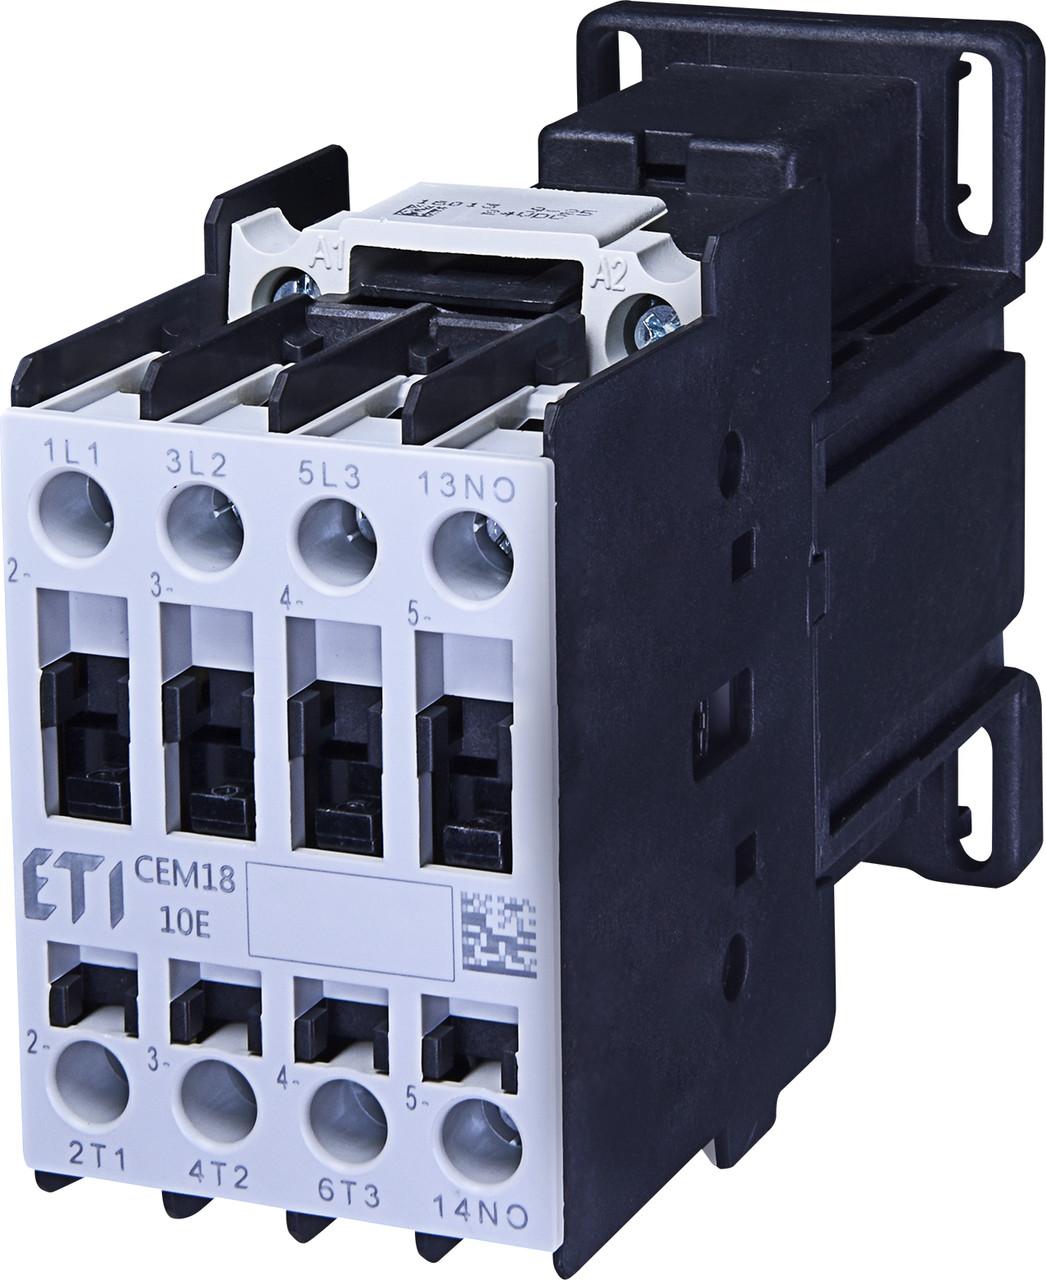 Контактор силовой ETI CEM 18.10 18А 24V DC 3NO+1NO 7.5kW 464220 (на DIN-рейку, 32A AC1, 18A AC3)